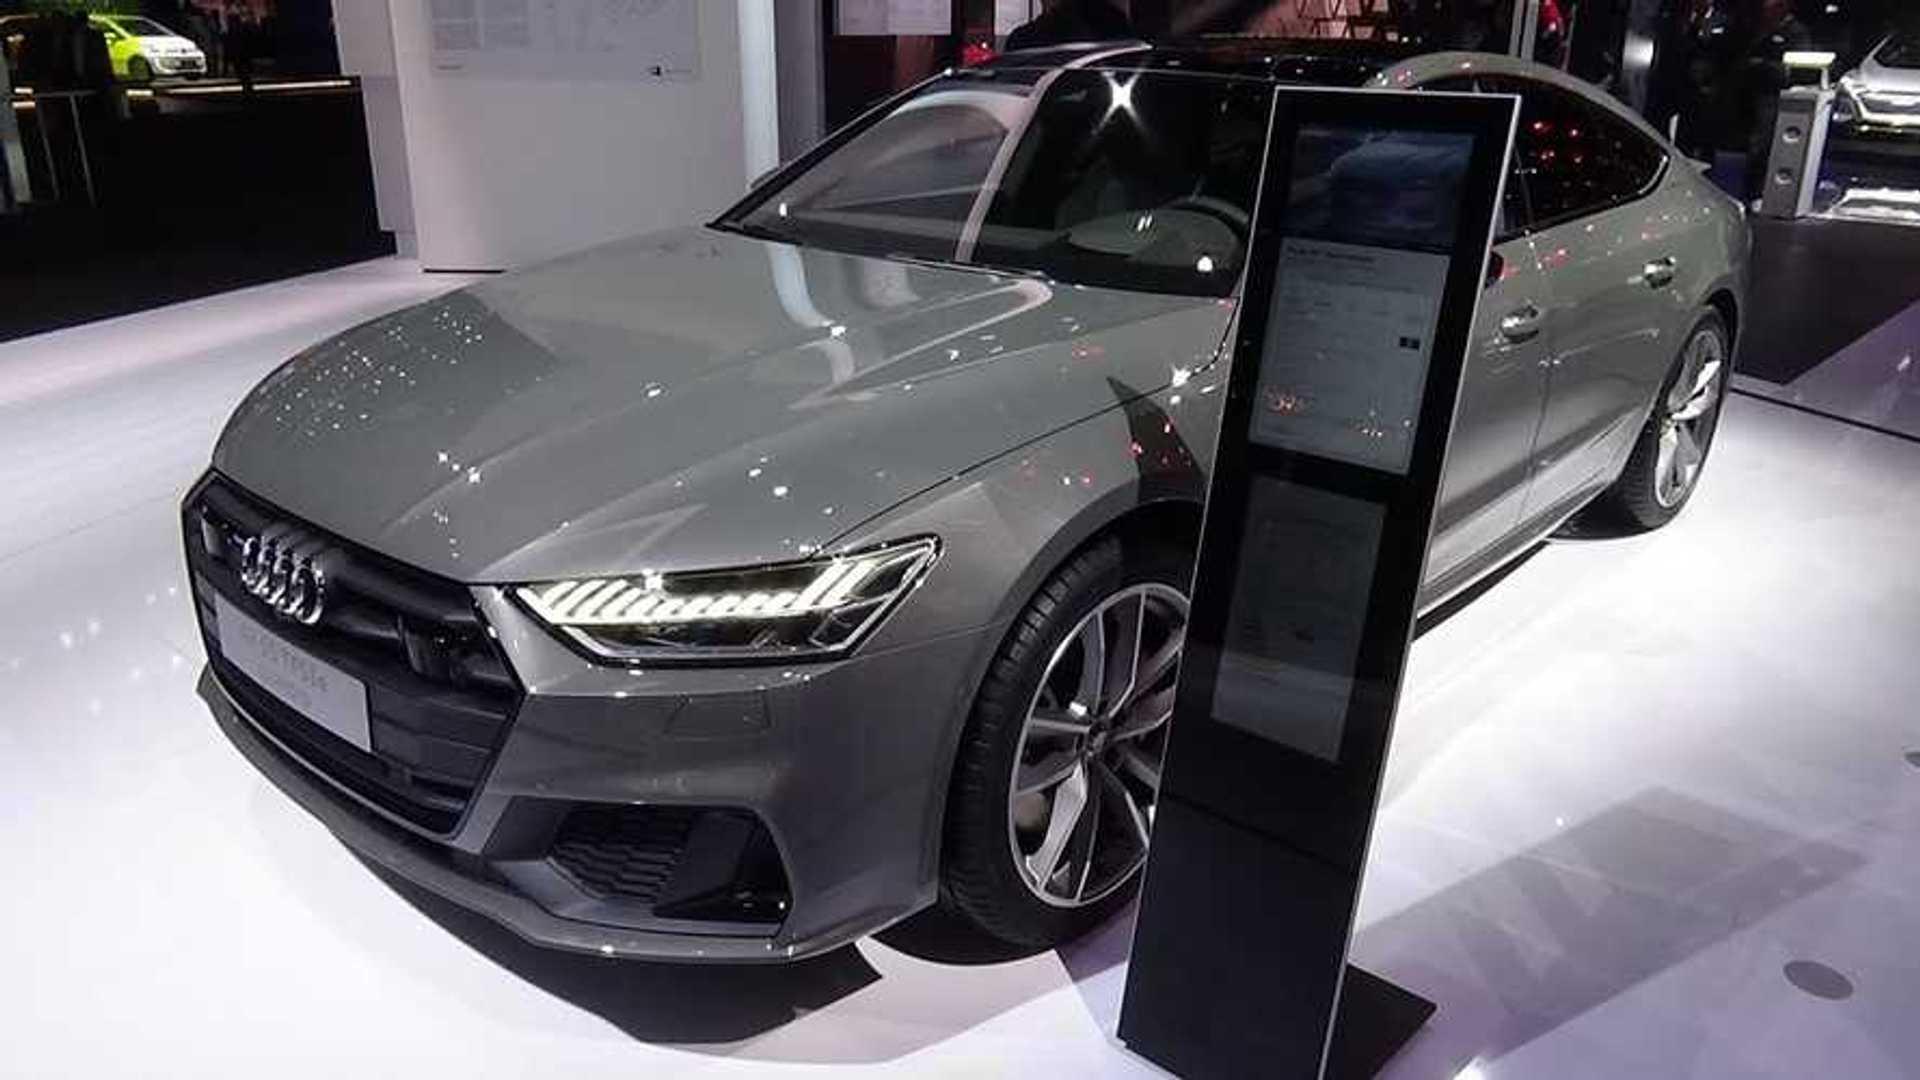 Audi A14 Sportback 14 TFSI e quattro At IAA: Specs, Video, Price | minimum price of audi car